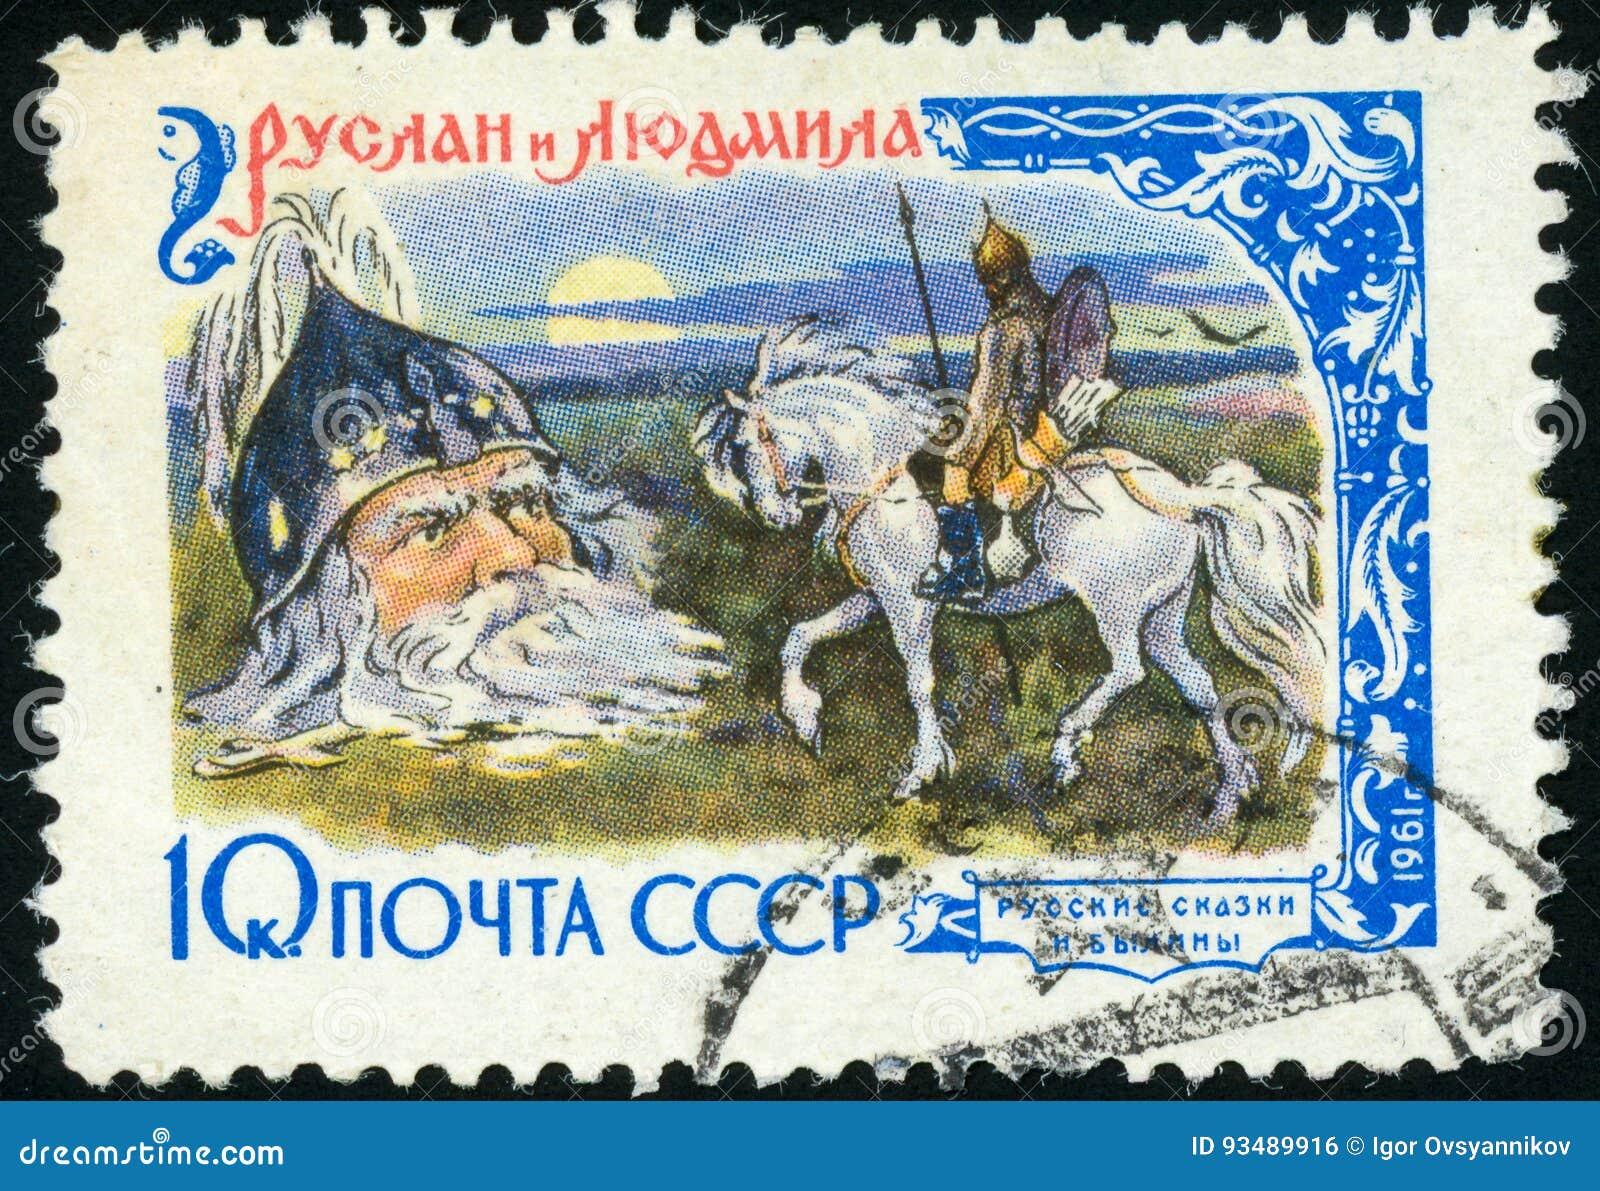 Glinka: Ruslan and Lyudmila, Op. 5